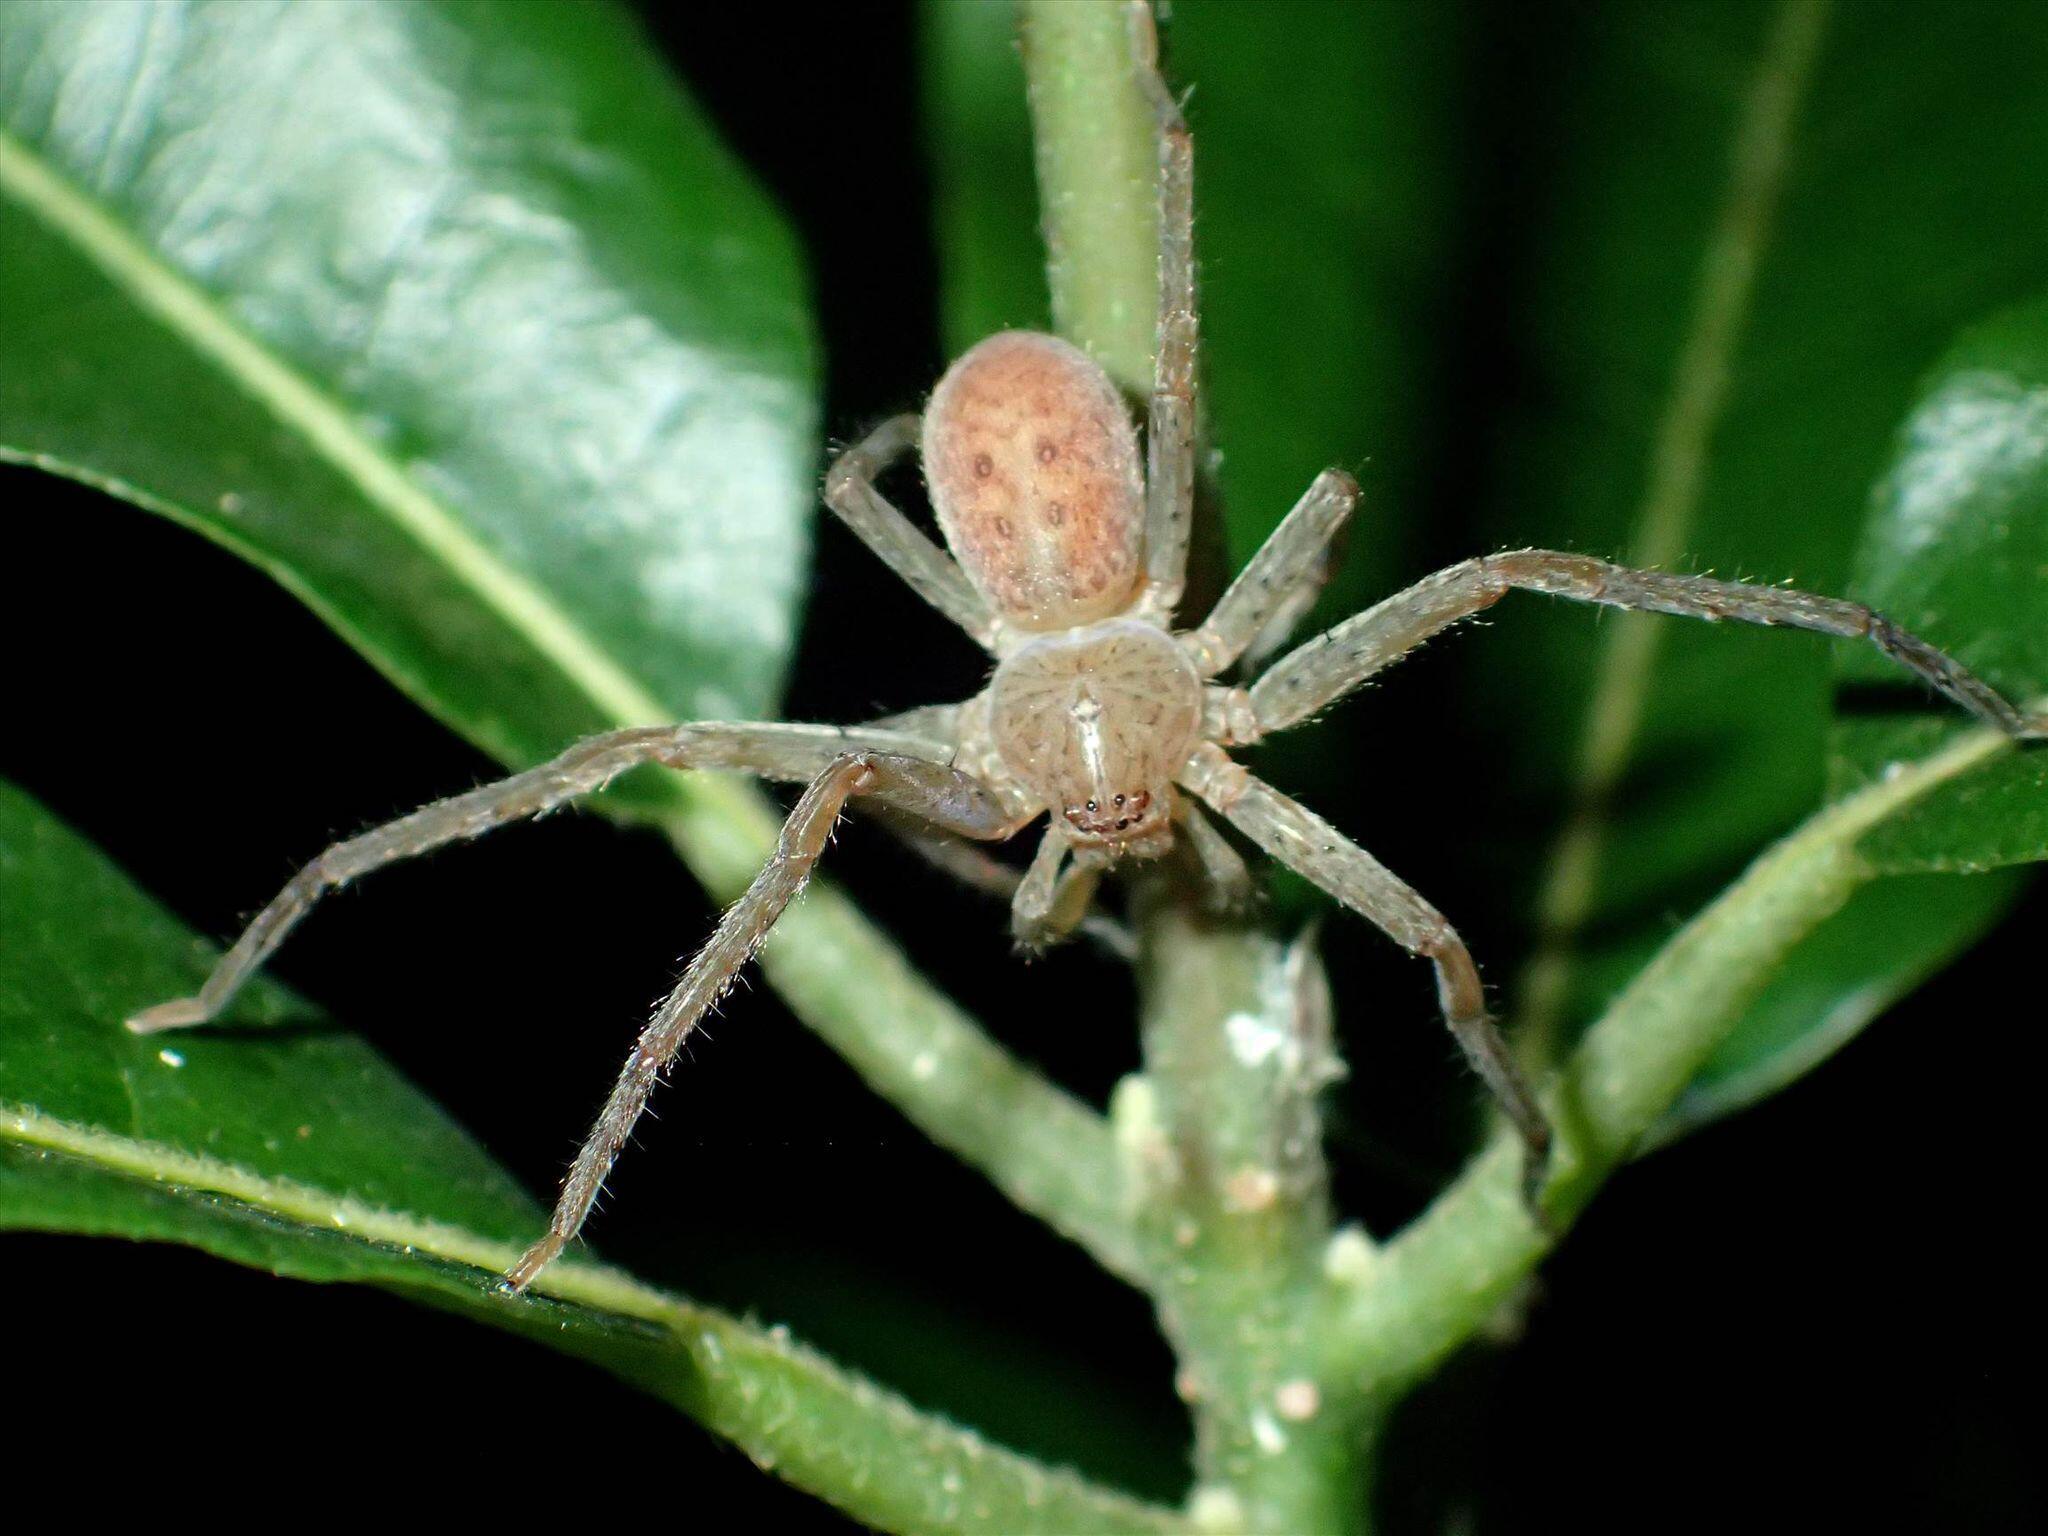 Bild zu Spinnen nach Klima-Aktivistin Greta Thunberg benannt